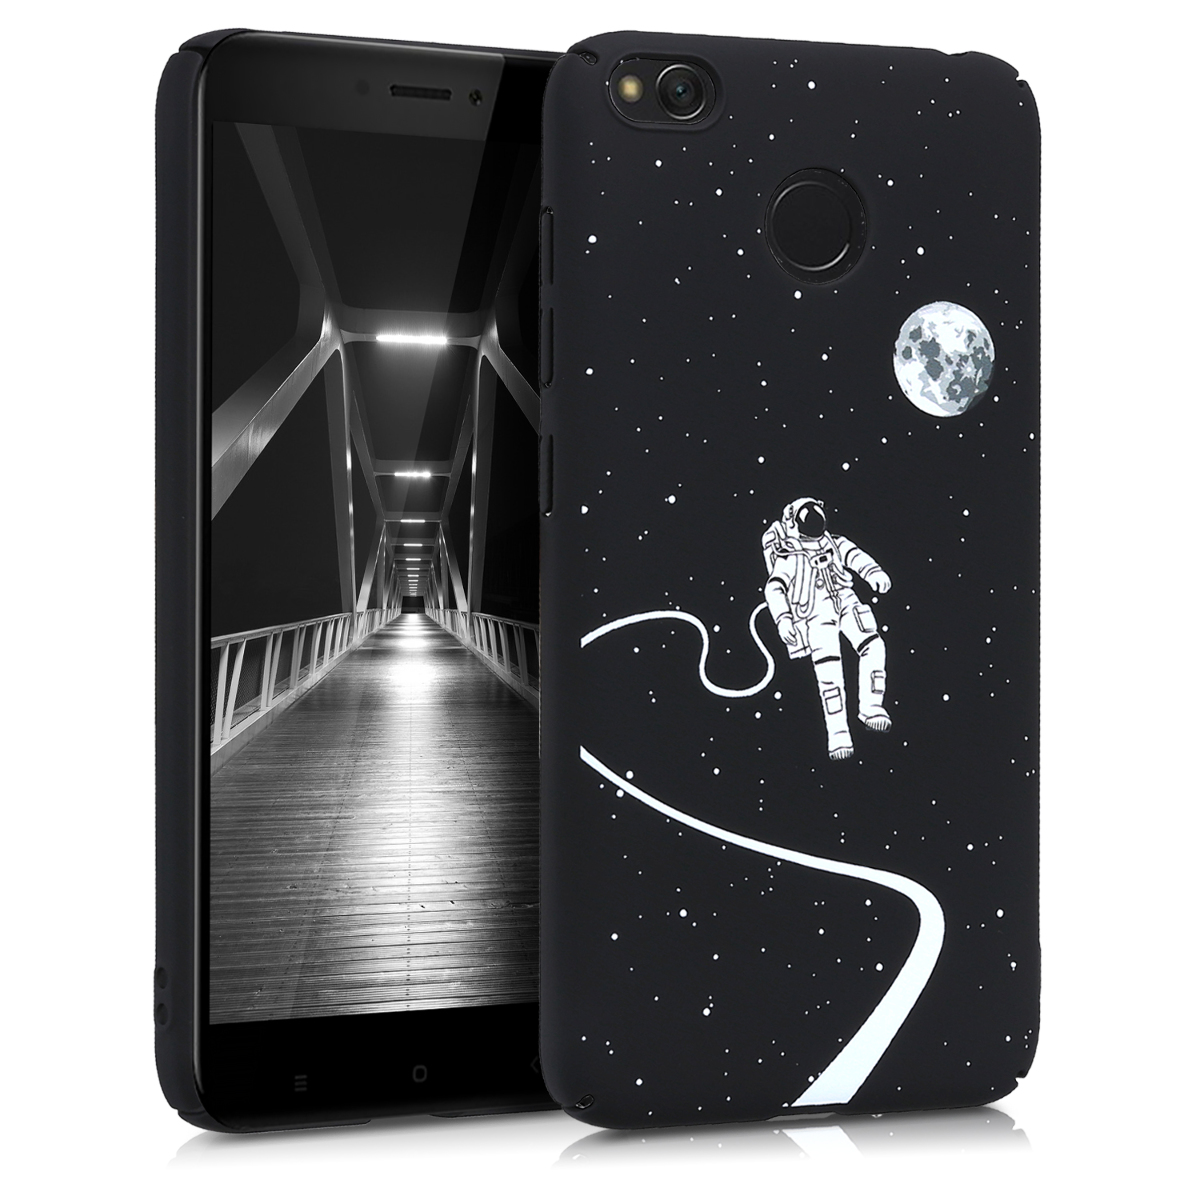 KW Slim Anti-Slip Cover - Σκληρή Θήκη Καουτσούκ Xiaomi Redmi 4/4X - White / Black - (44856.01)